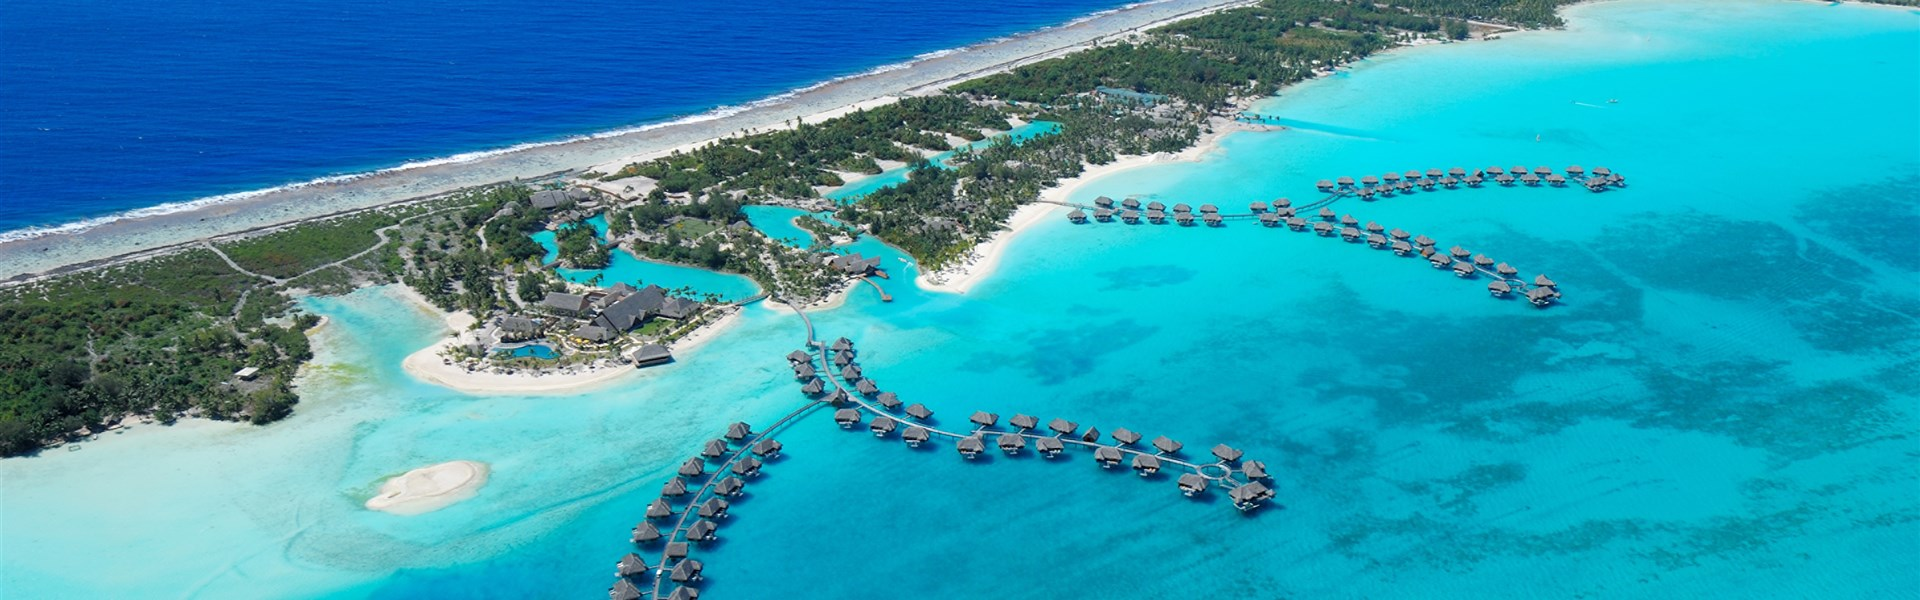 Four Seasons Resort - ostrov Bora Bora -